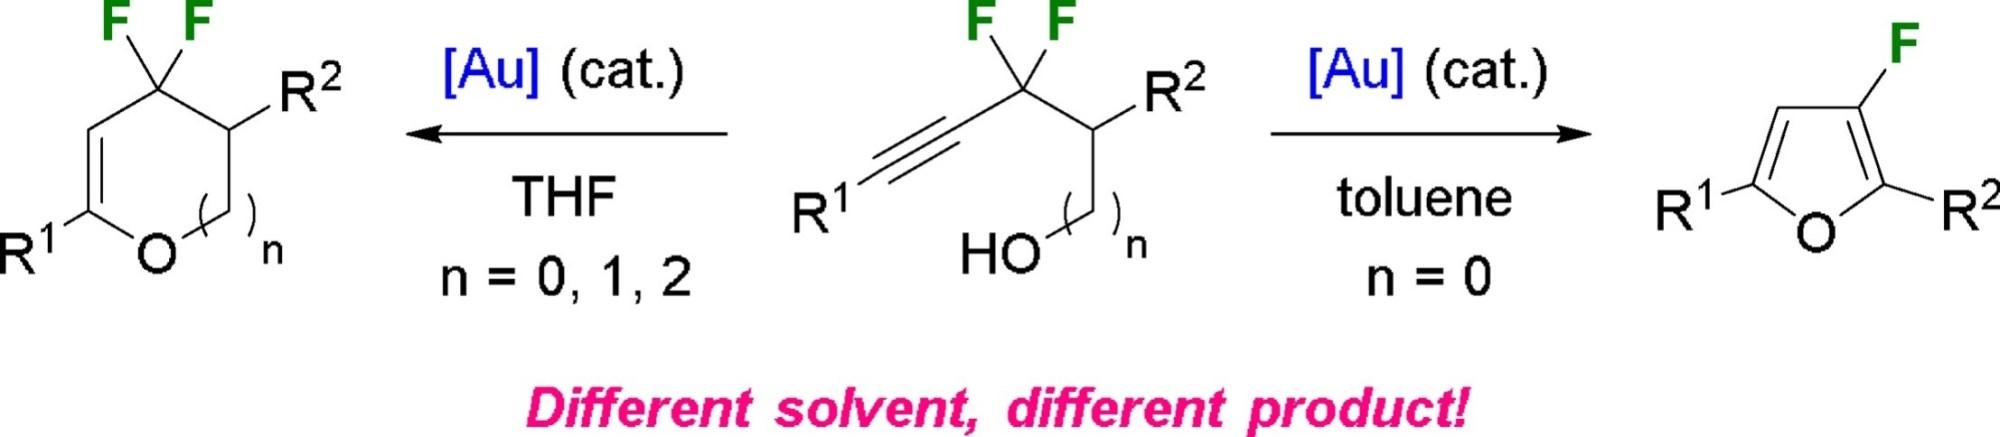 hight resolution of hamel j d paquin j f au catalyzed intramolecular hydroalkoxylation of gem difluorinated alkynols journal of fluorine chemistry 2018 216 11 23